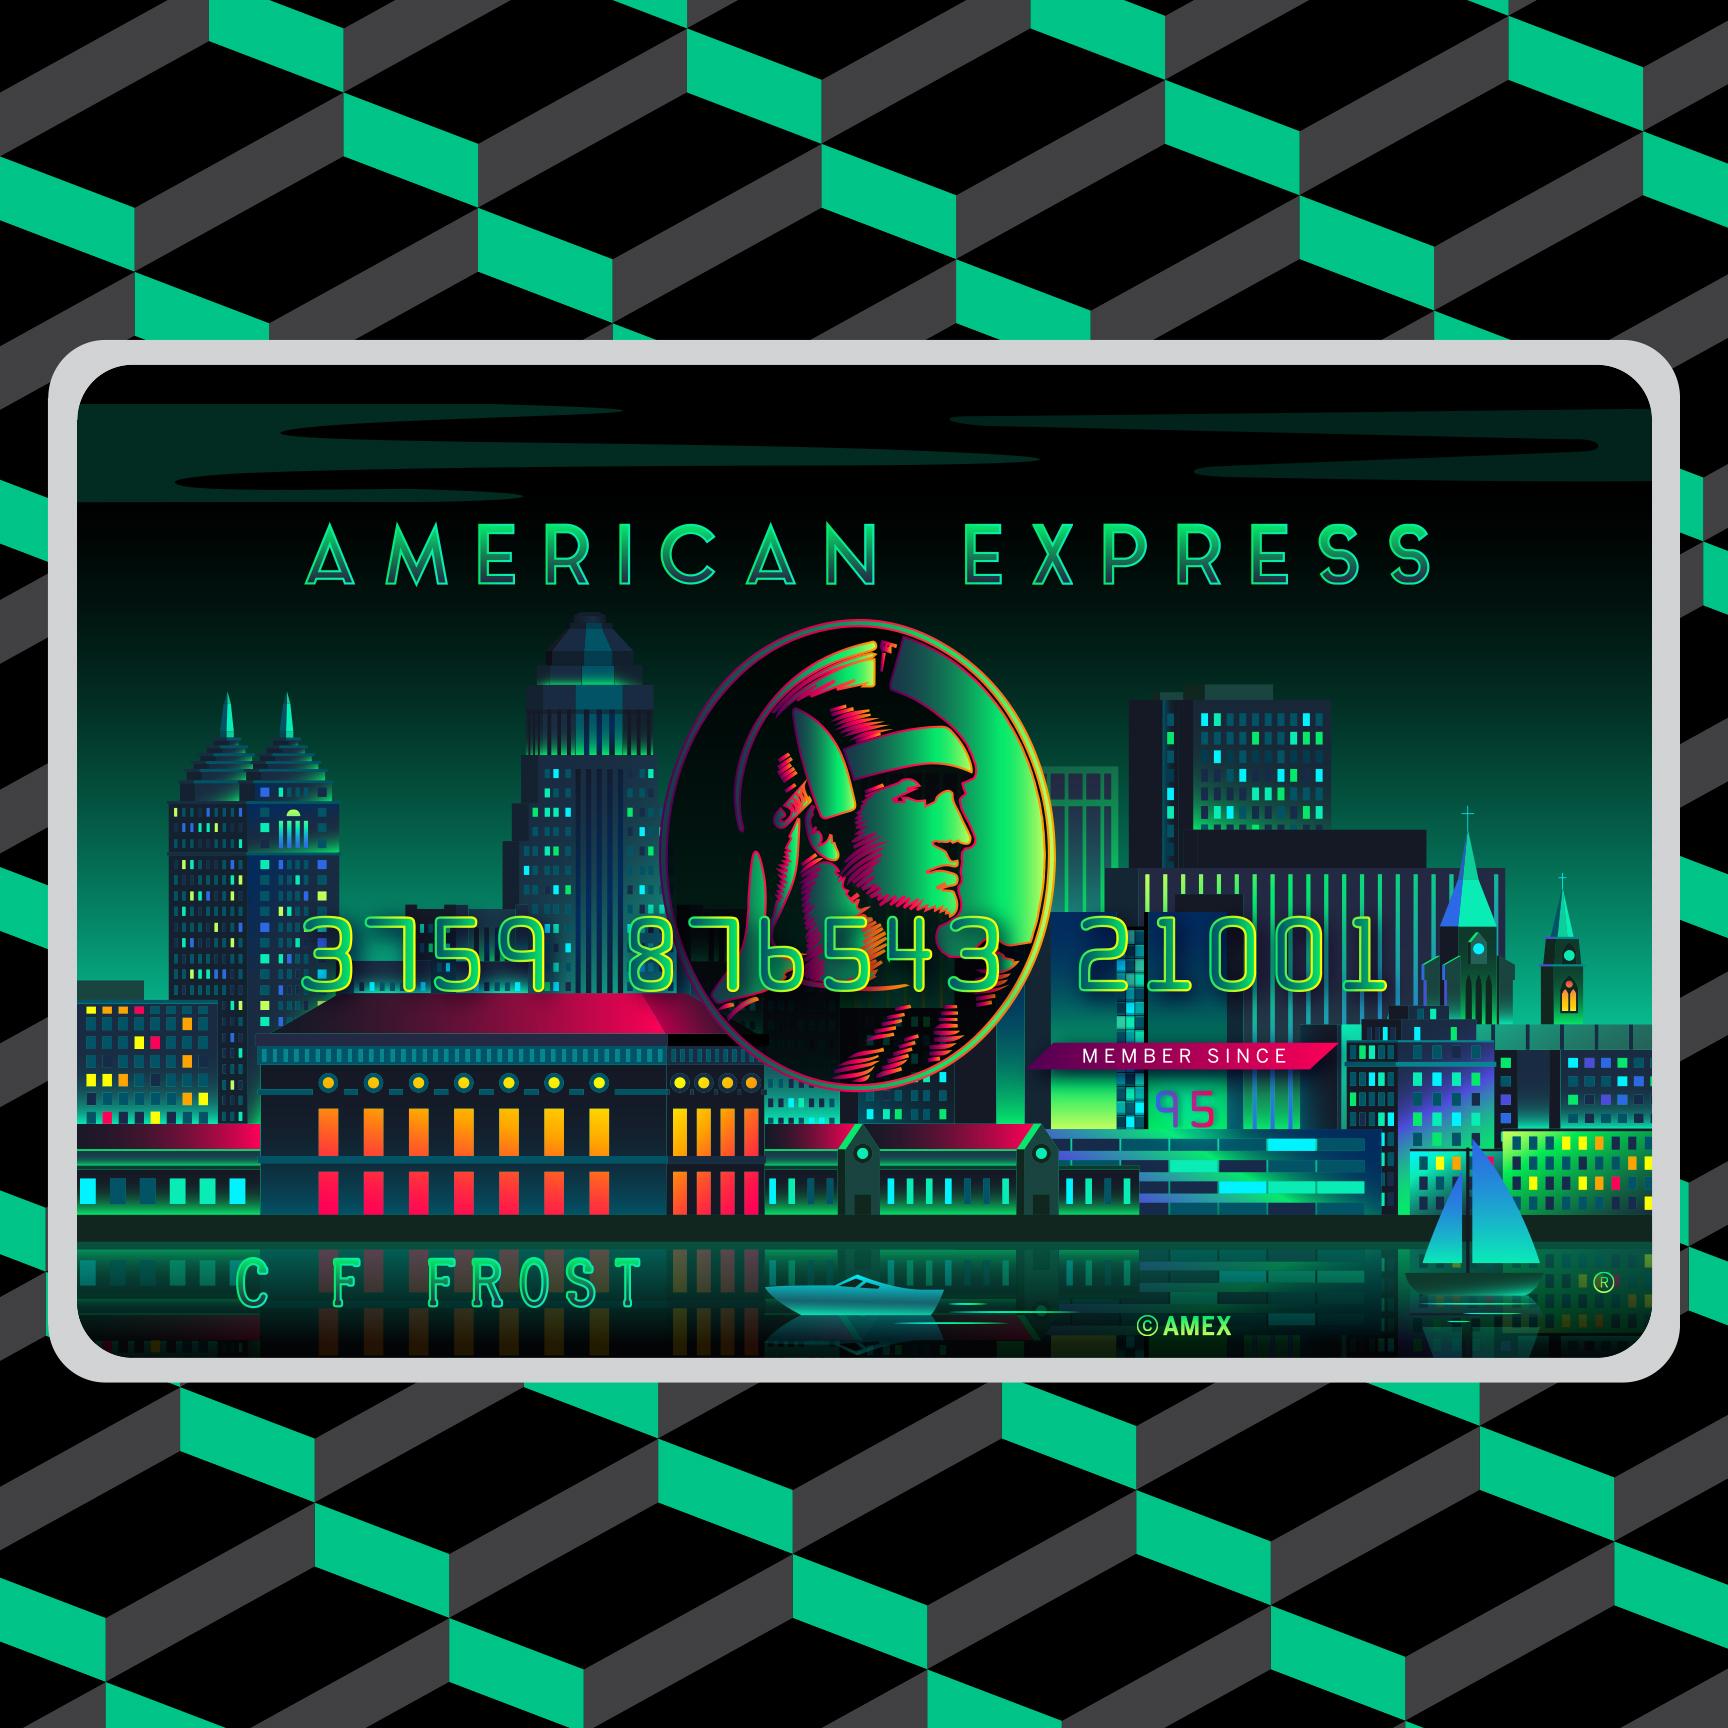 American Express Card Art AHA Design 1728x1728